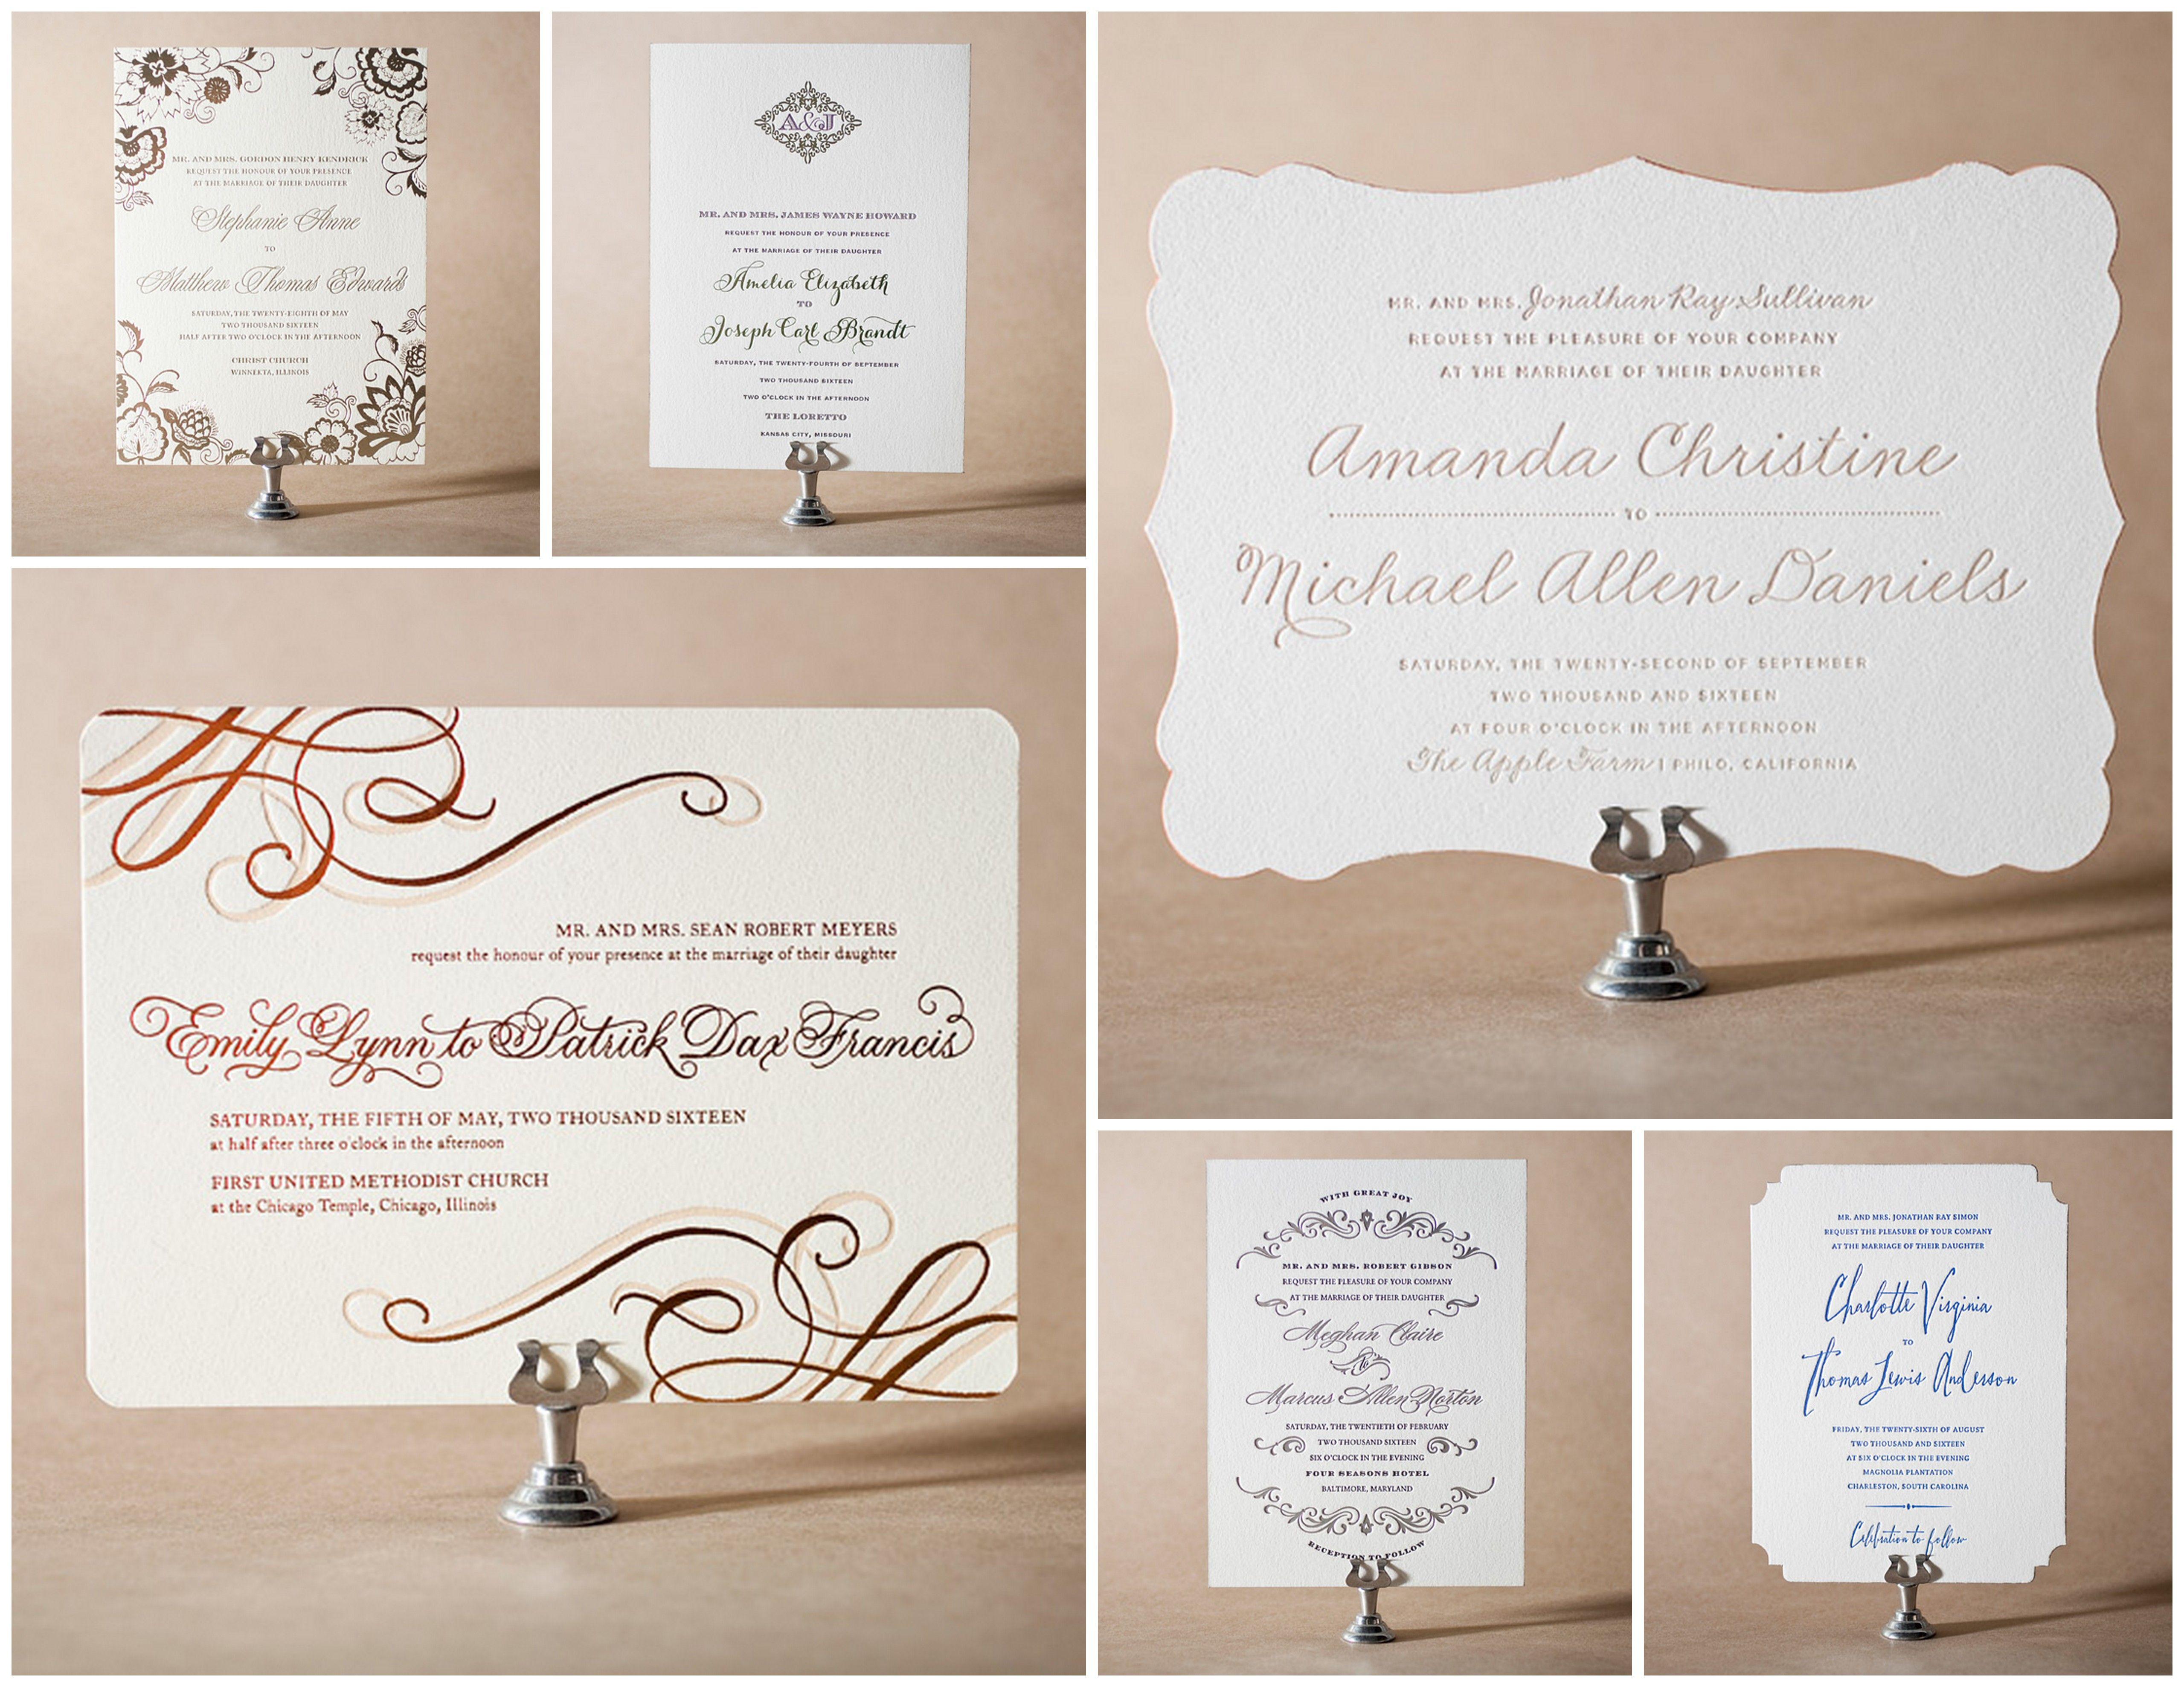 Formal Wedding Invitations | Wedding Day | Pinterest | Formal ...